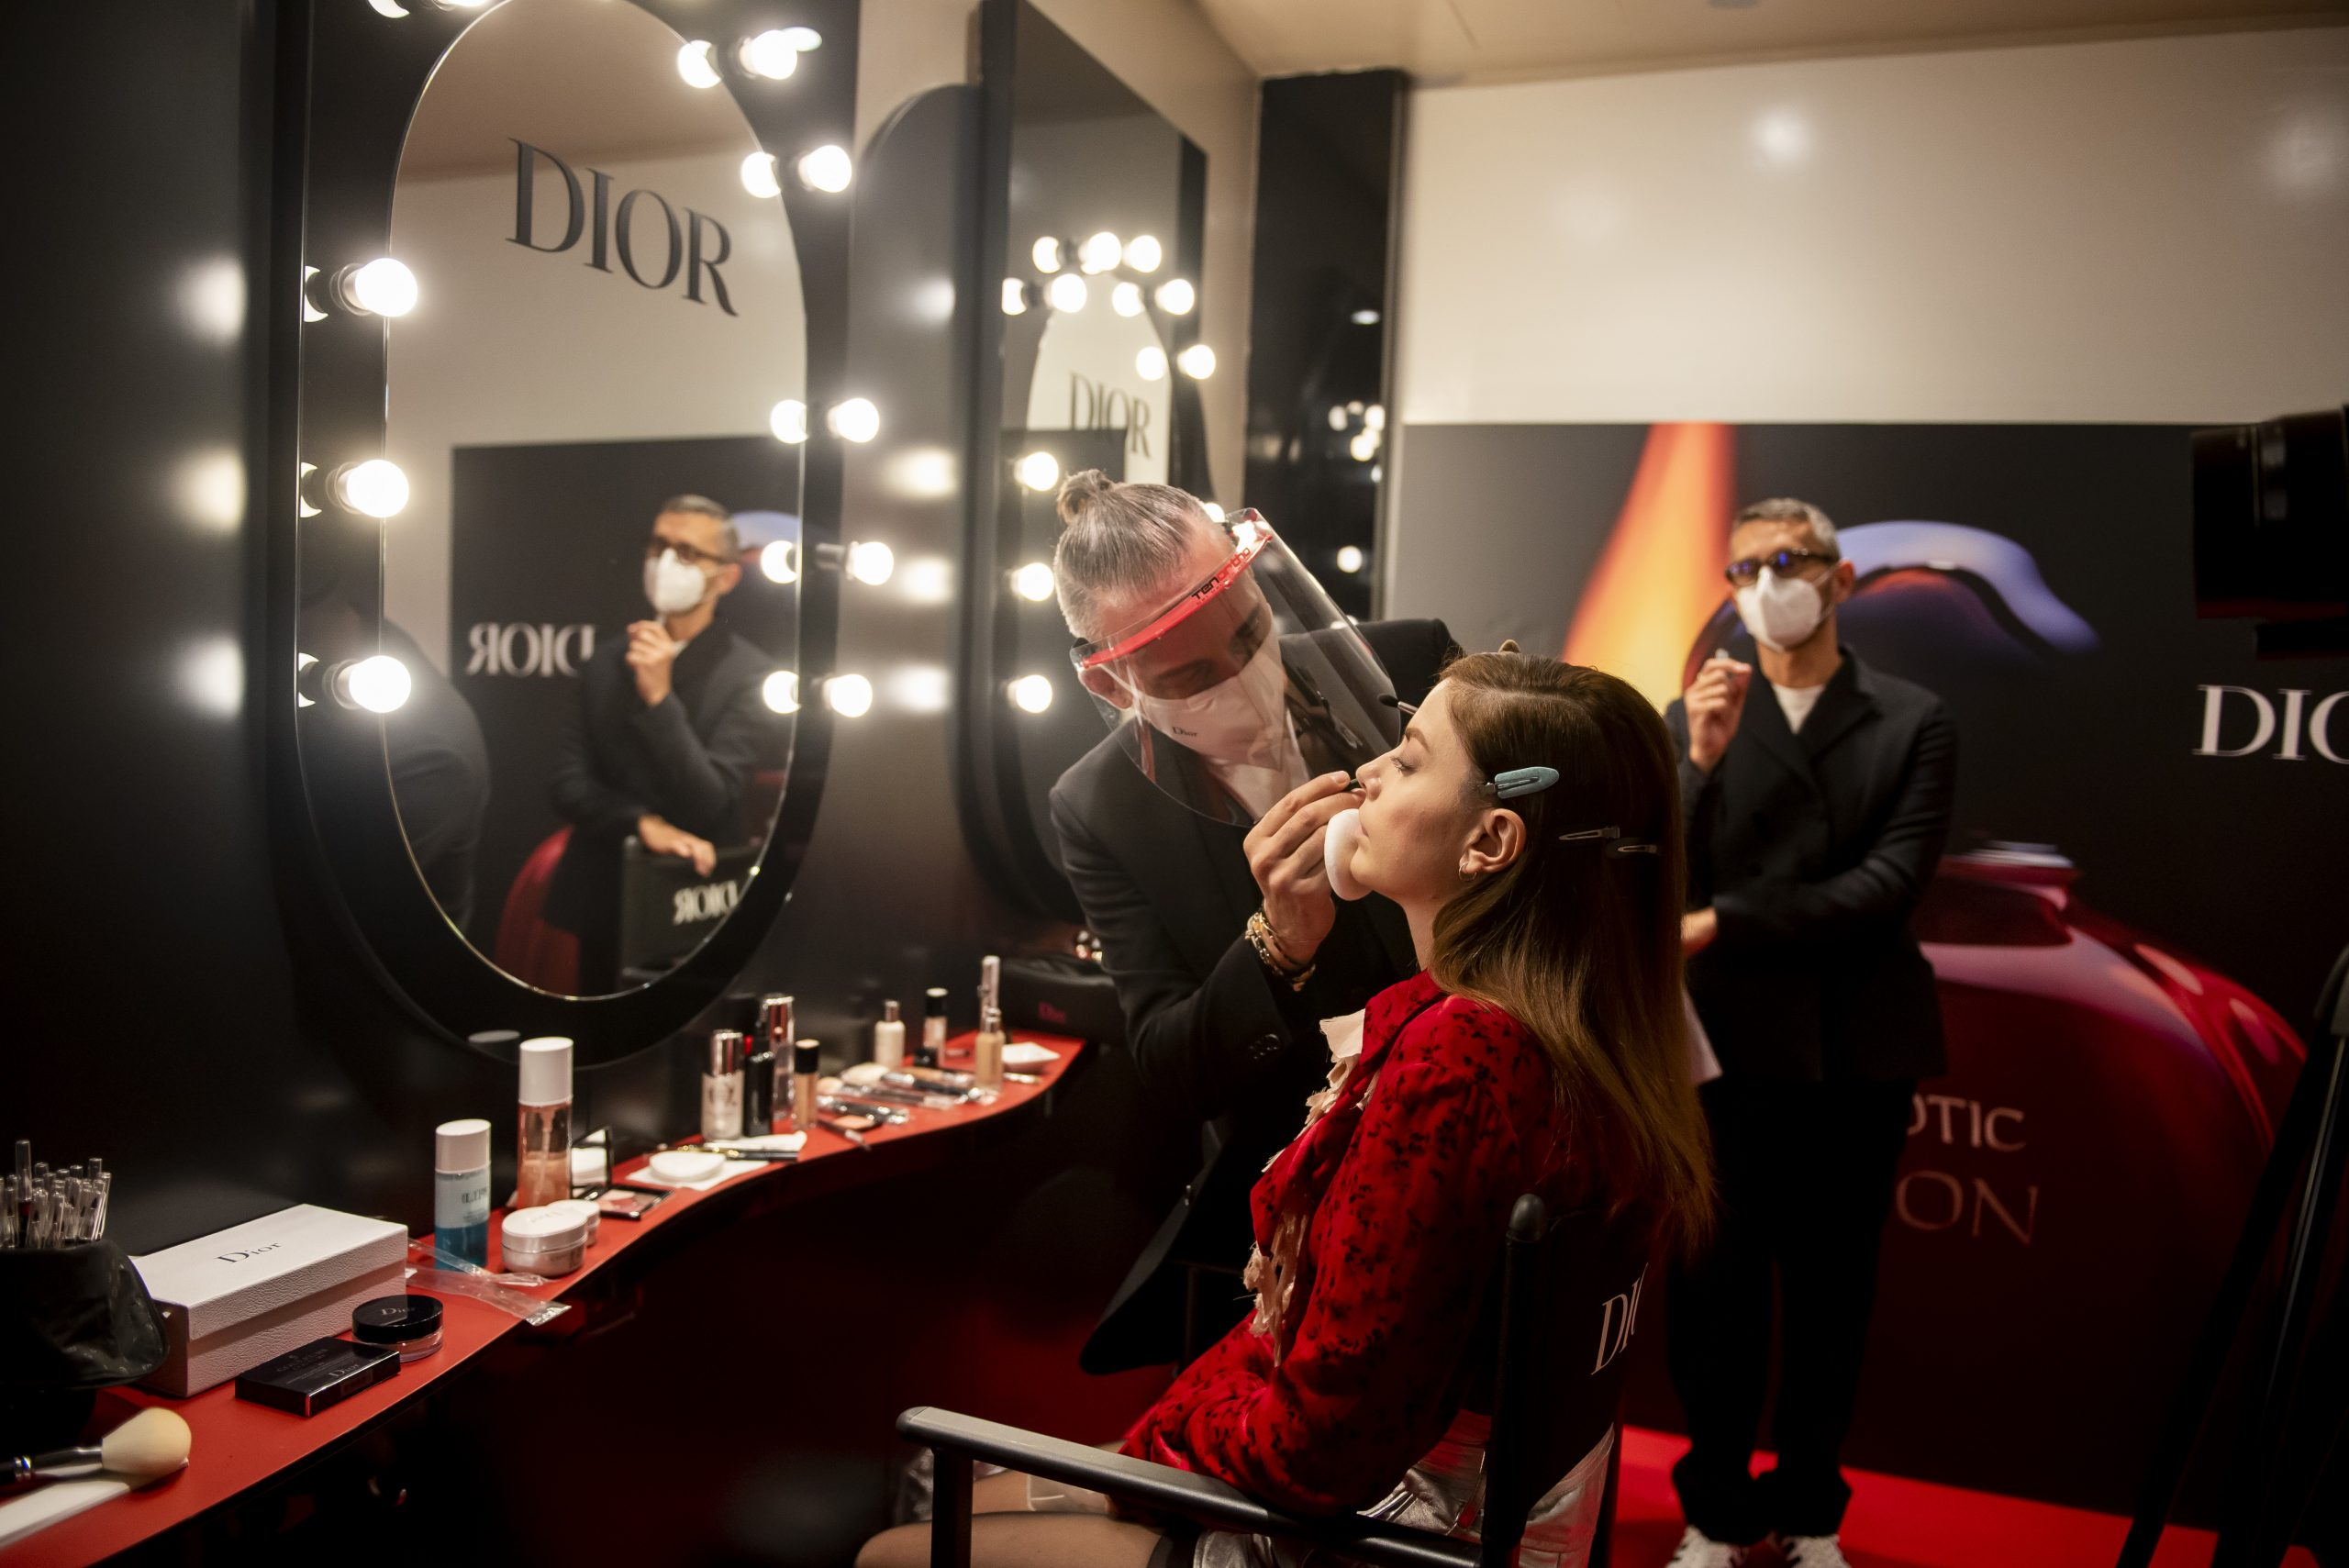 VF Stage Dior 5 - Benedetta Malavasi - Sponsor 1